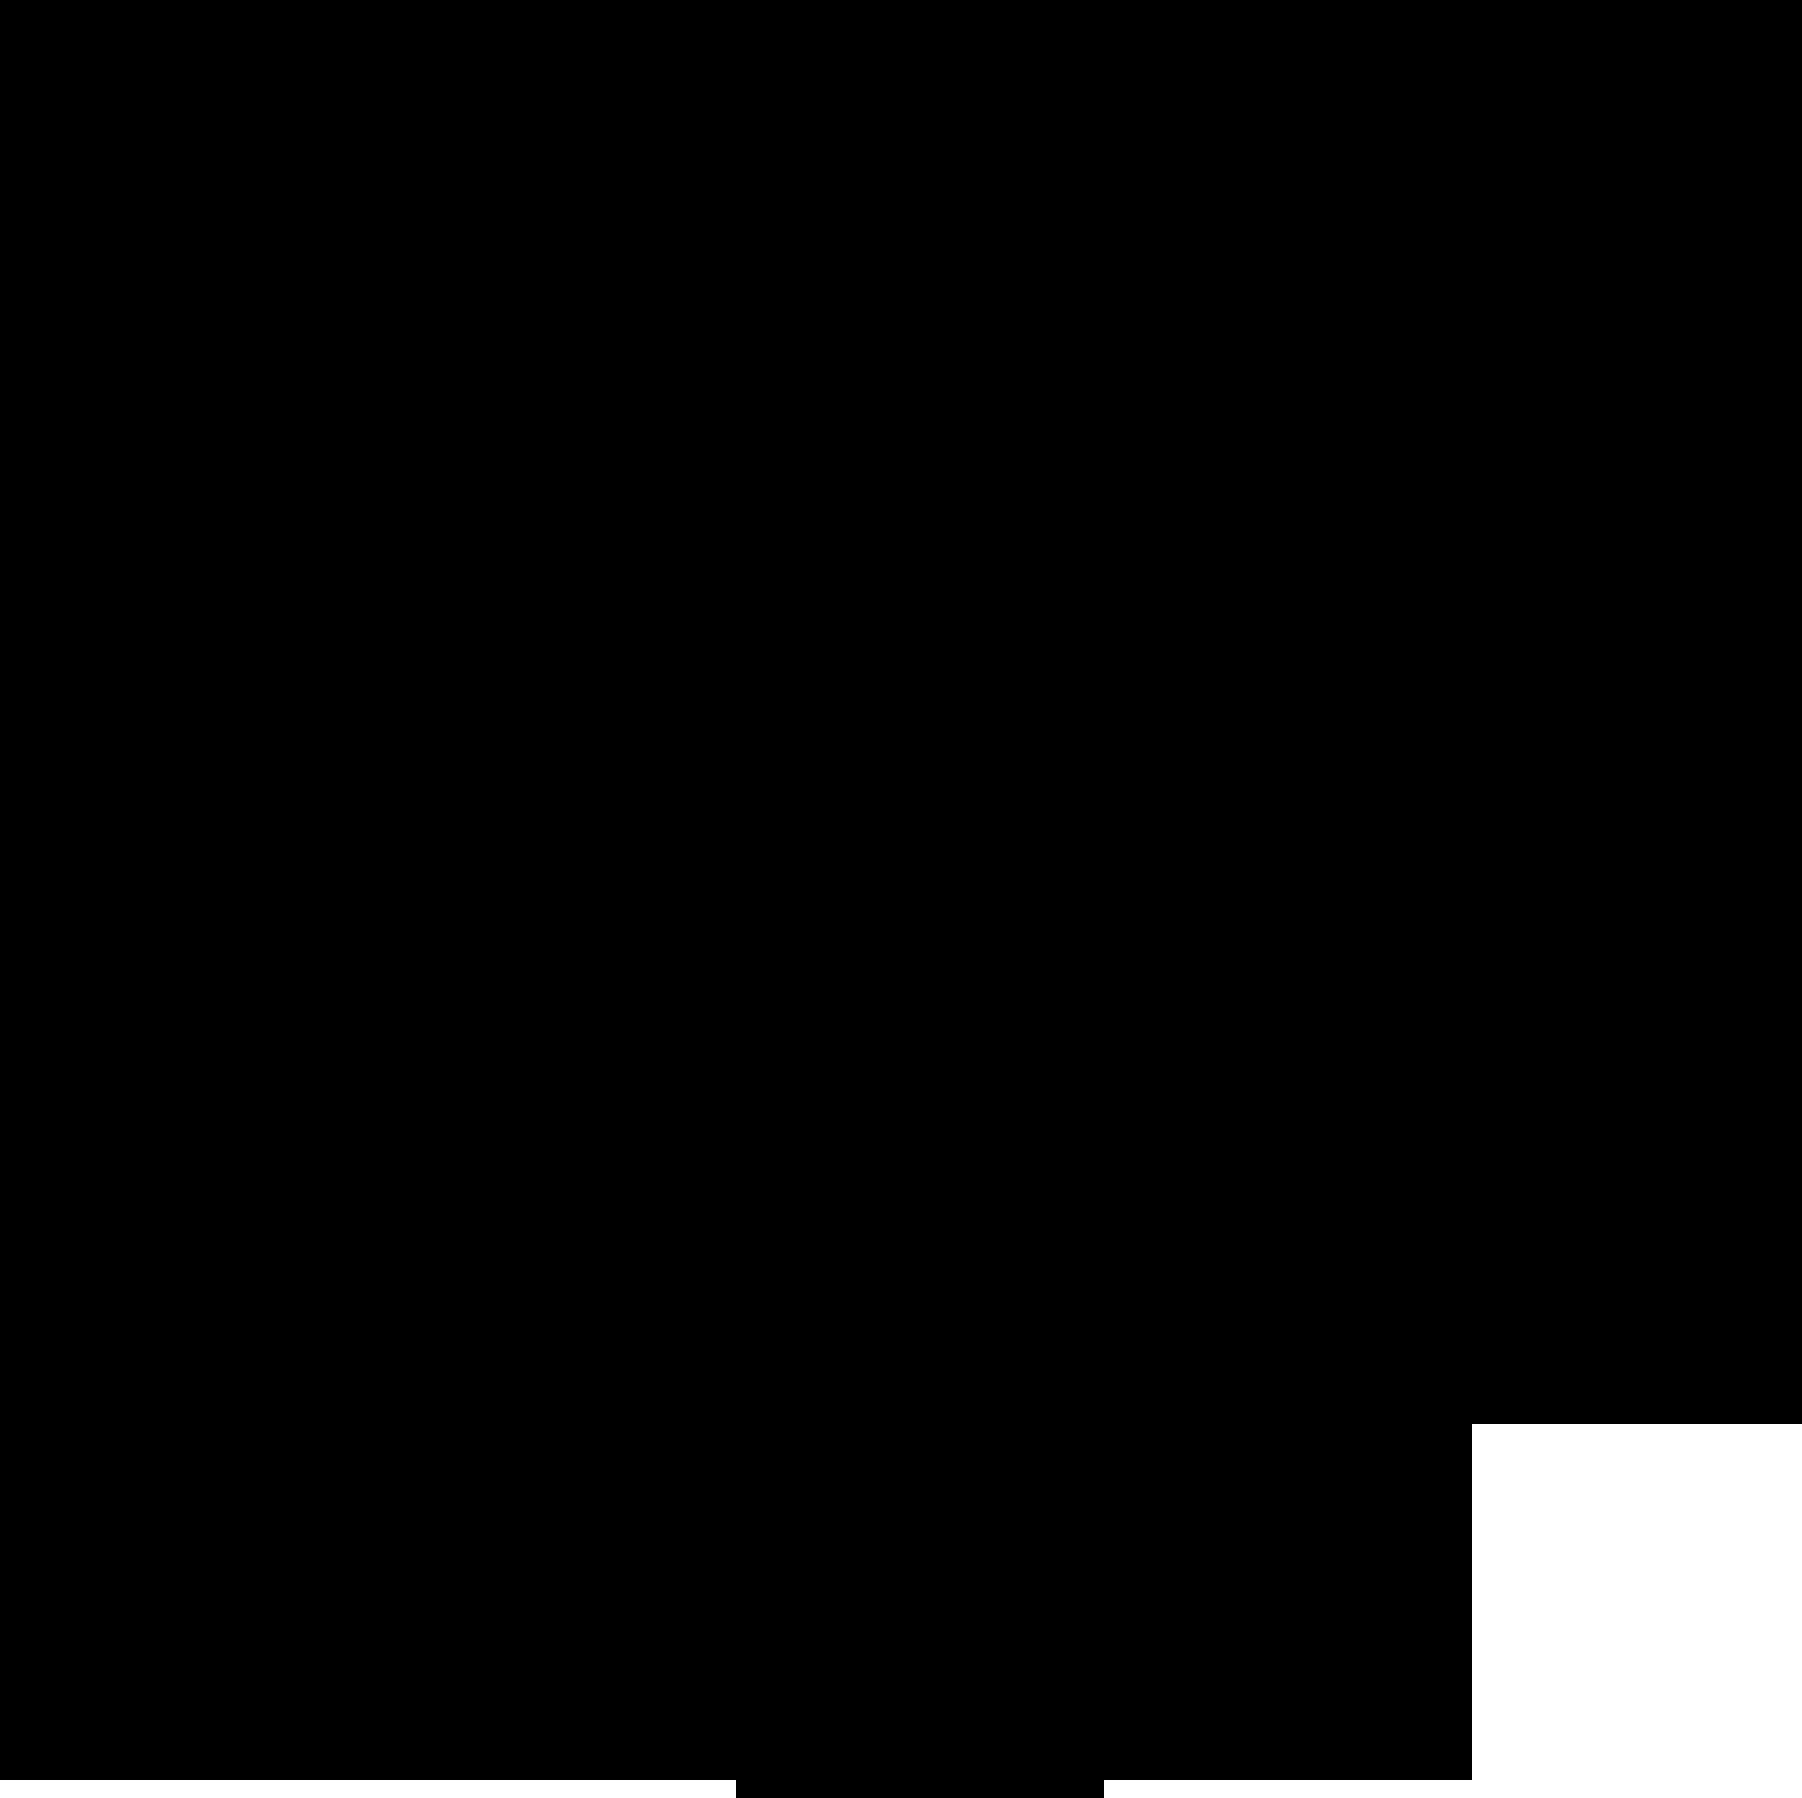 Clipart shield silhouette. Clip art torn paper